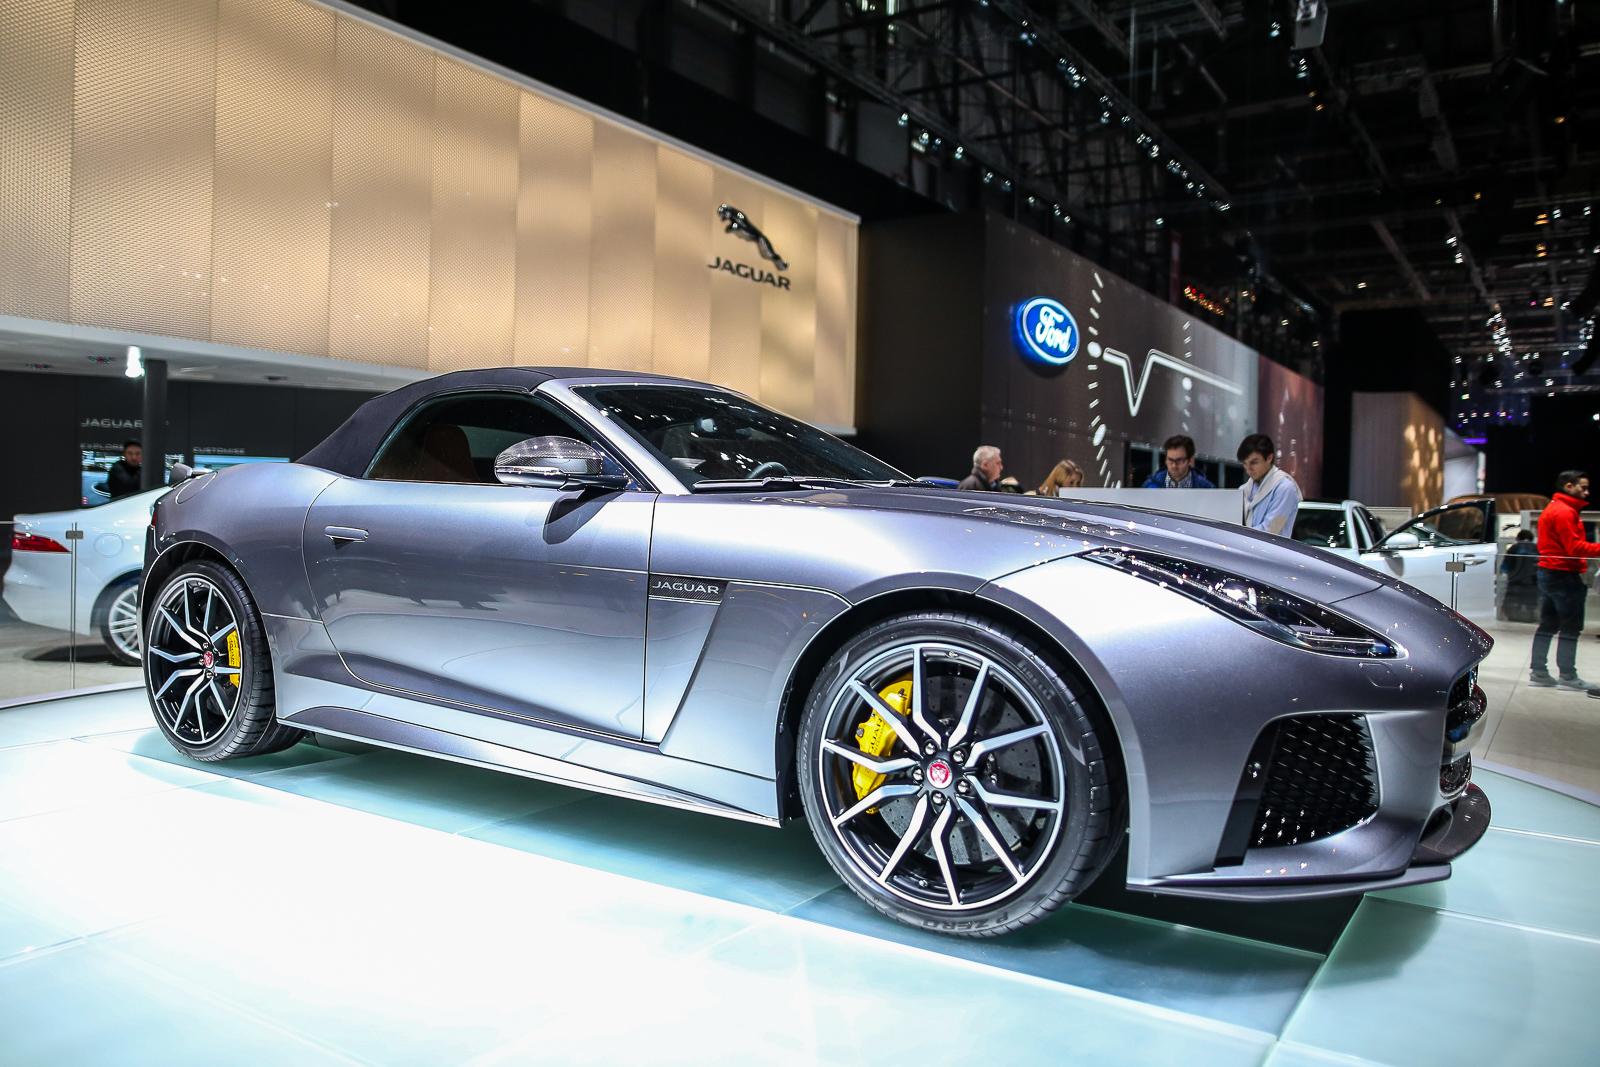 2017-Jaguar-F-Type-SVR-16